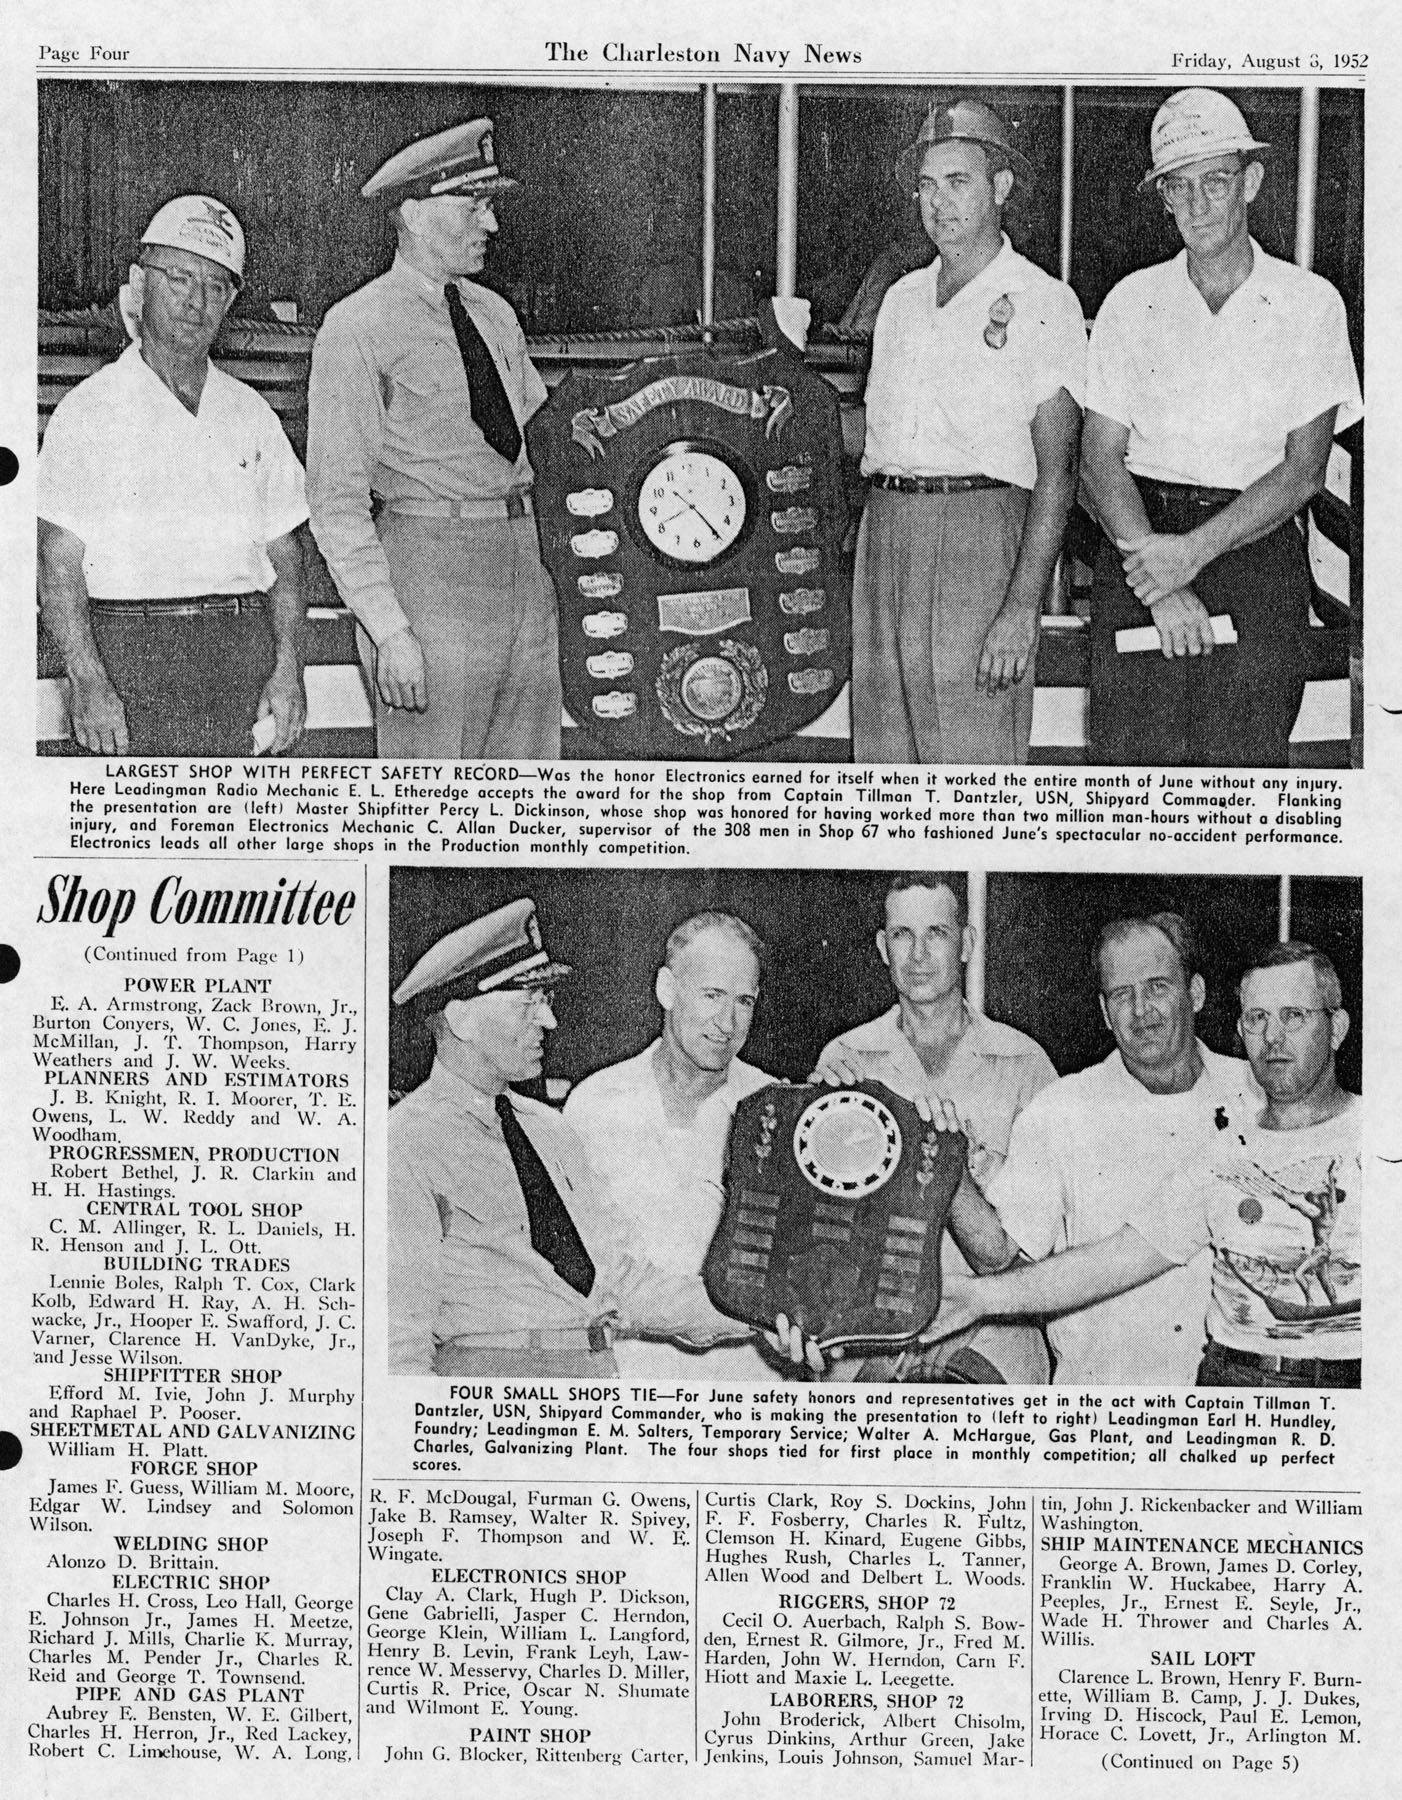 The Charleston Navy News, Volume 11, Edition 1, page iv